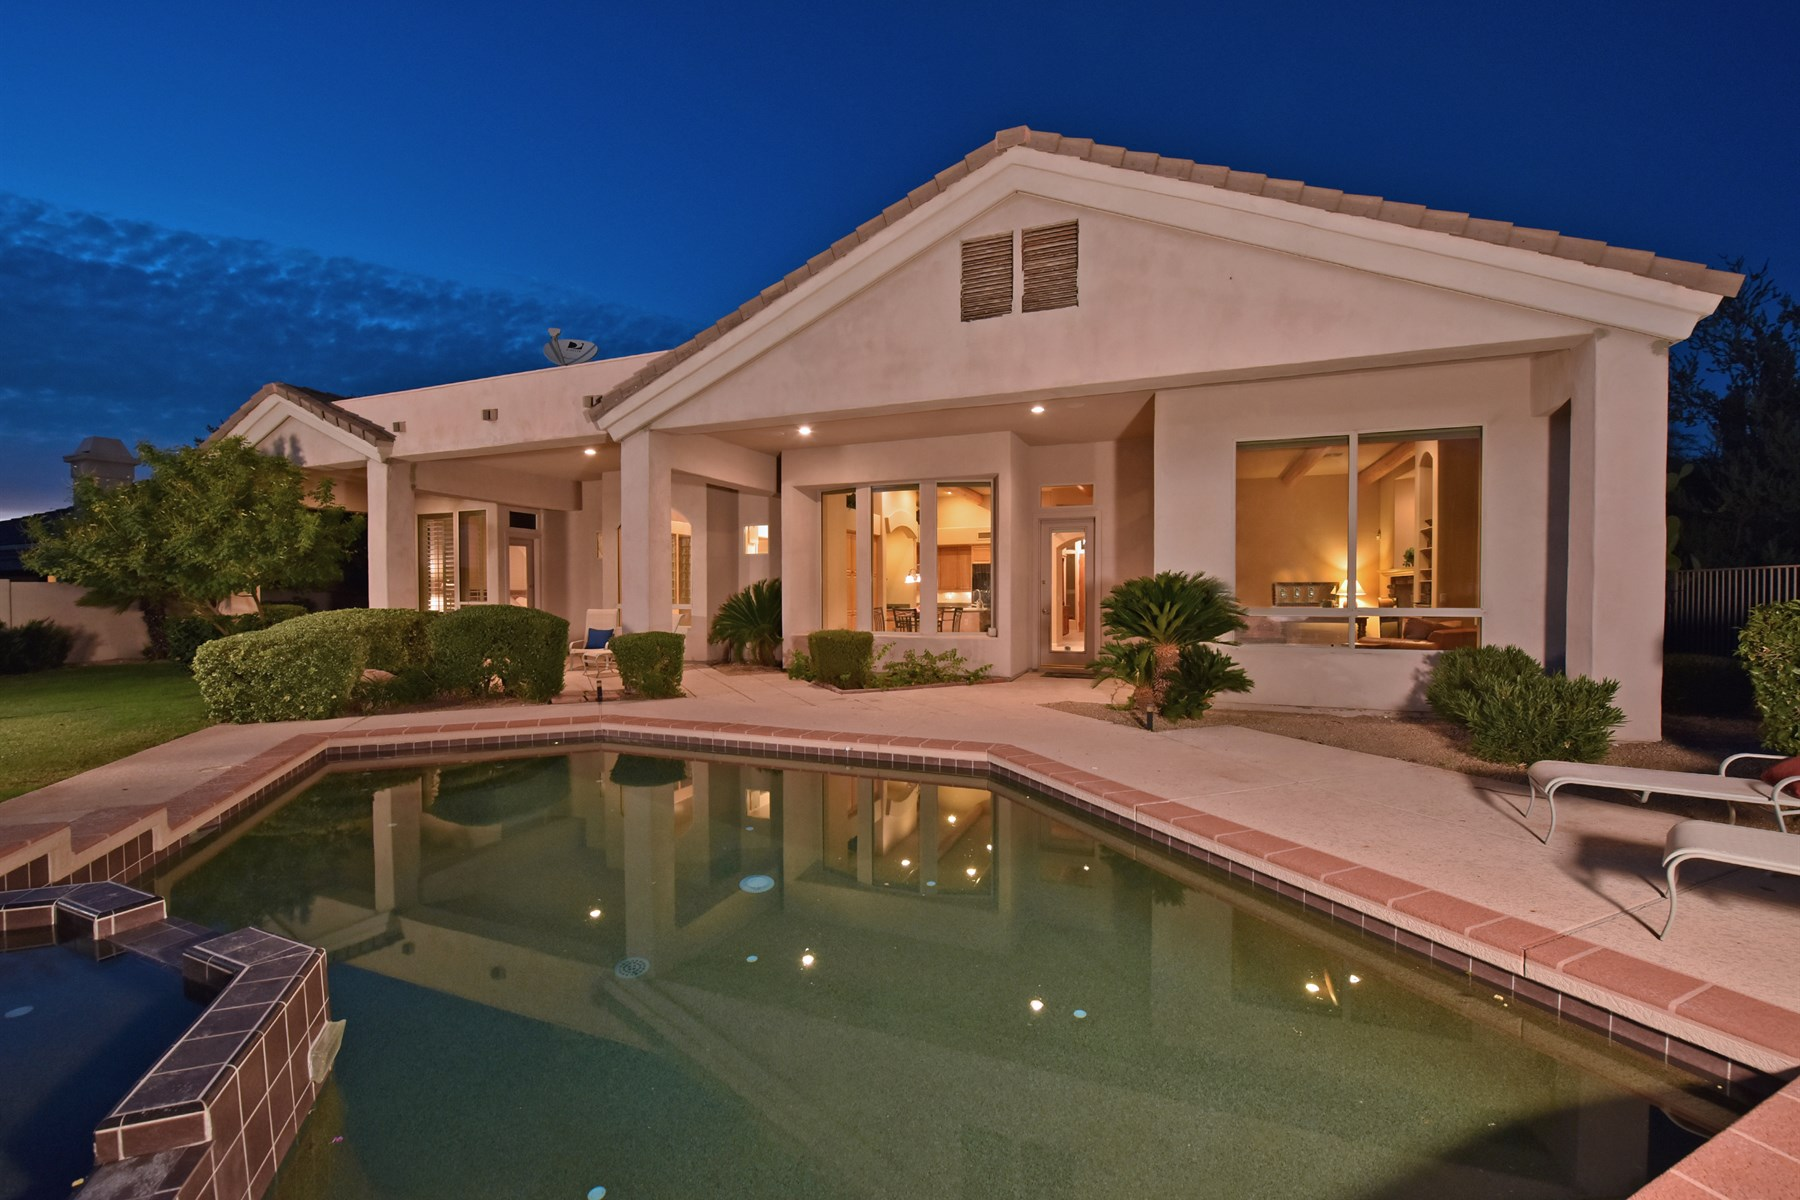 Casa para uma família para Venda às Great find at Saguaro Canyon in Troon Village on prime interior corner lot 11947 E Parkview Ln Scottsdale, Arizona, 85255 Estados Unidos